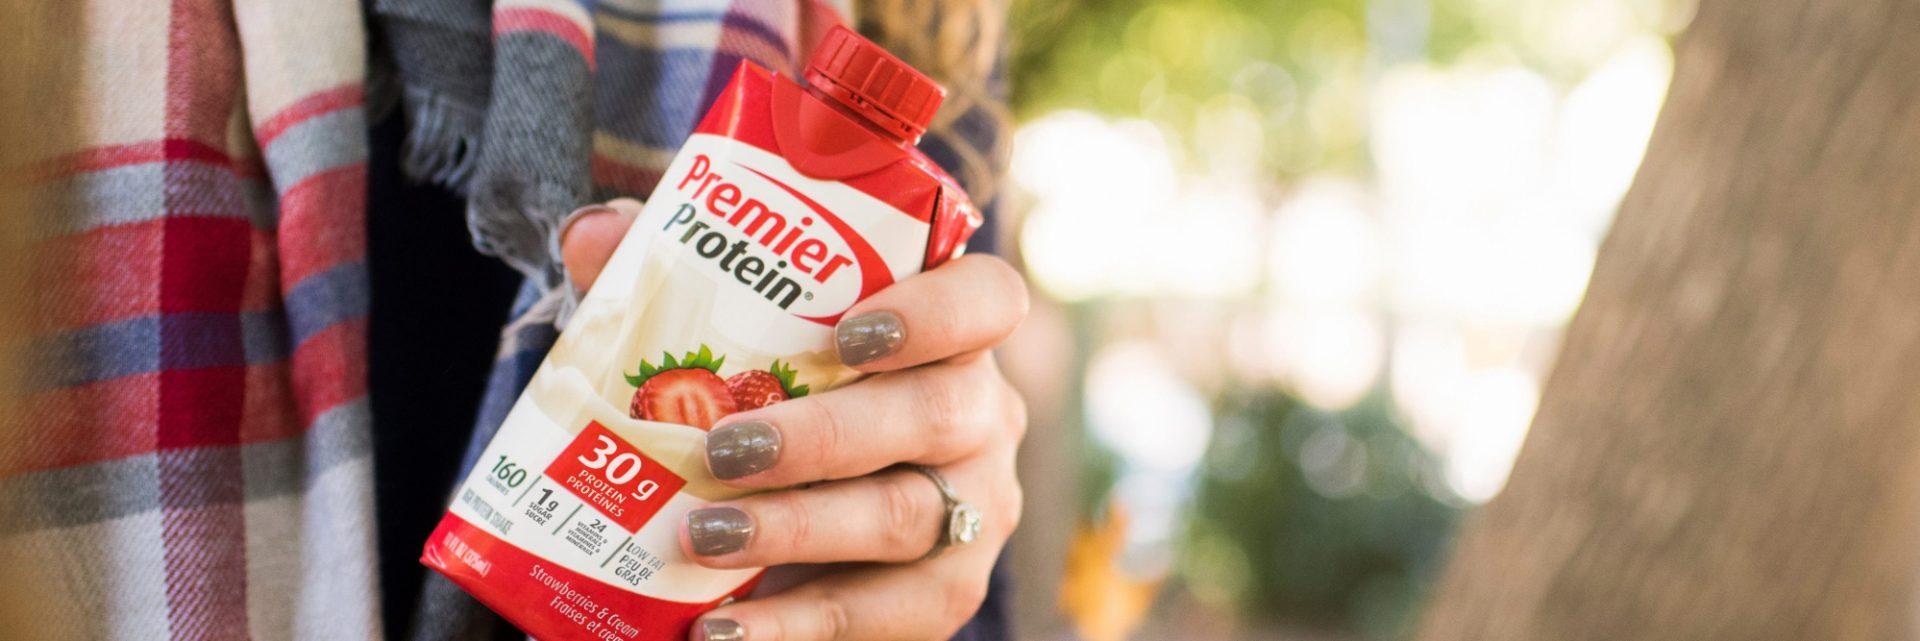 Profiter du plein air avec Canadian Premier Protein